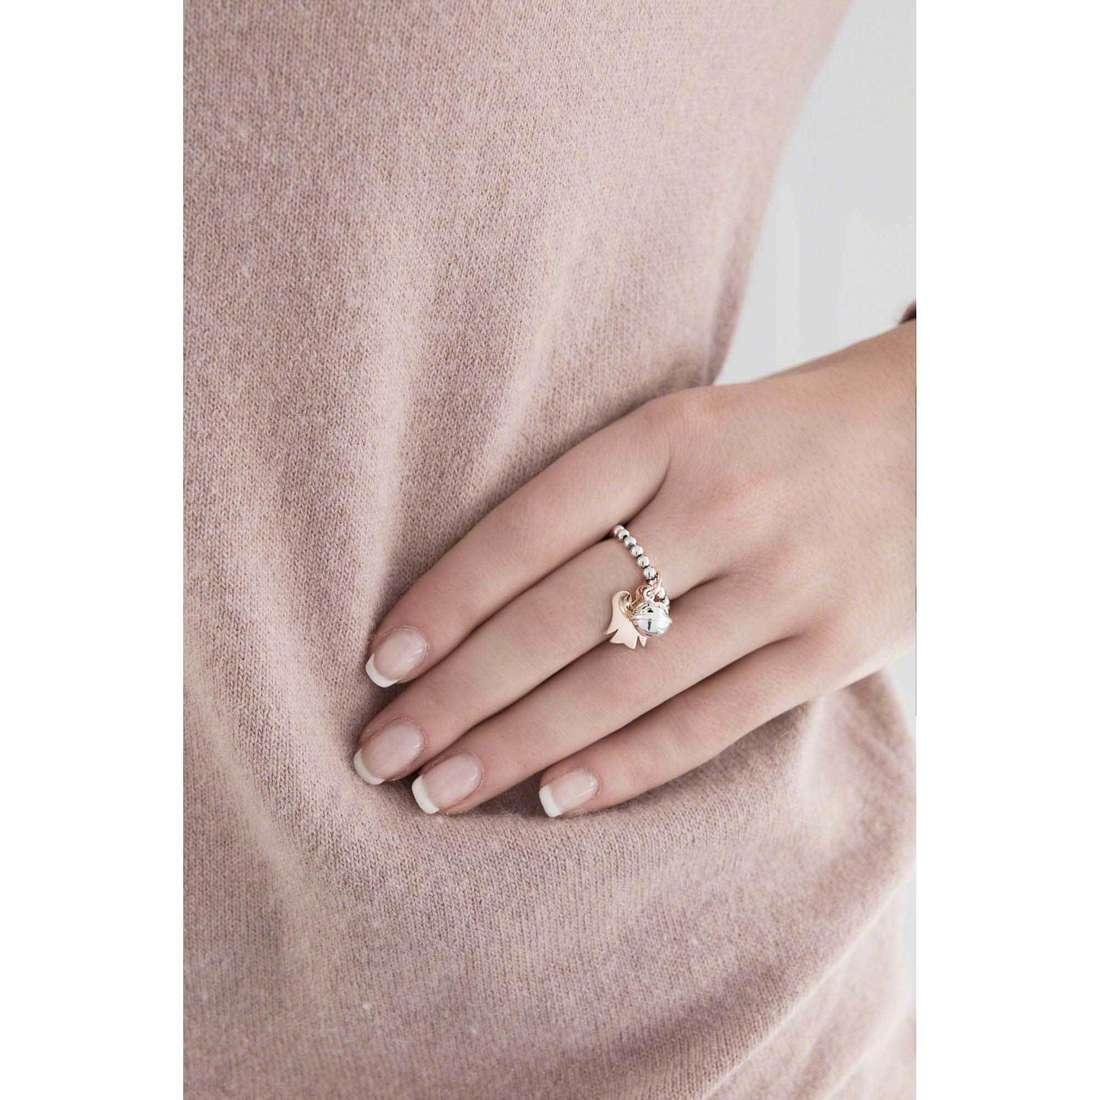 Giannotti anelli Chiama Angeli donna GIA243-13-15 indosso